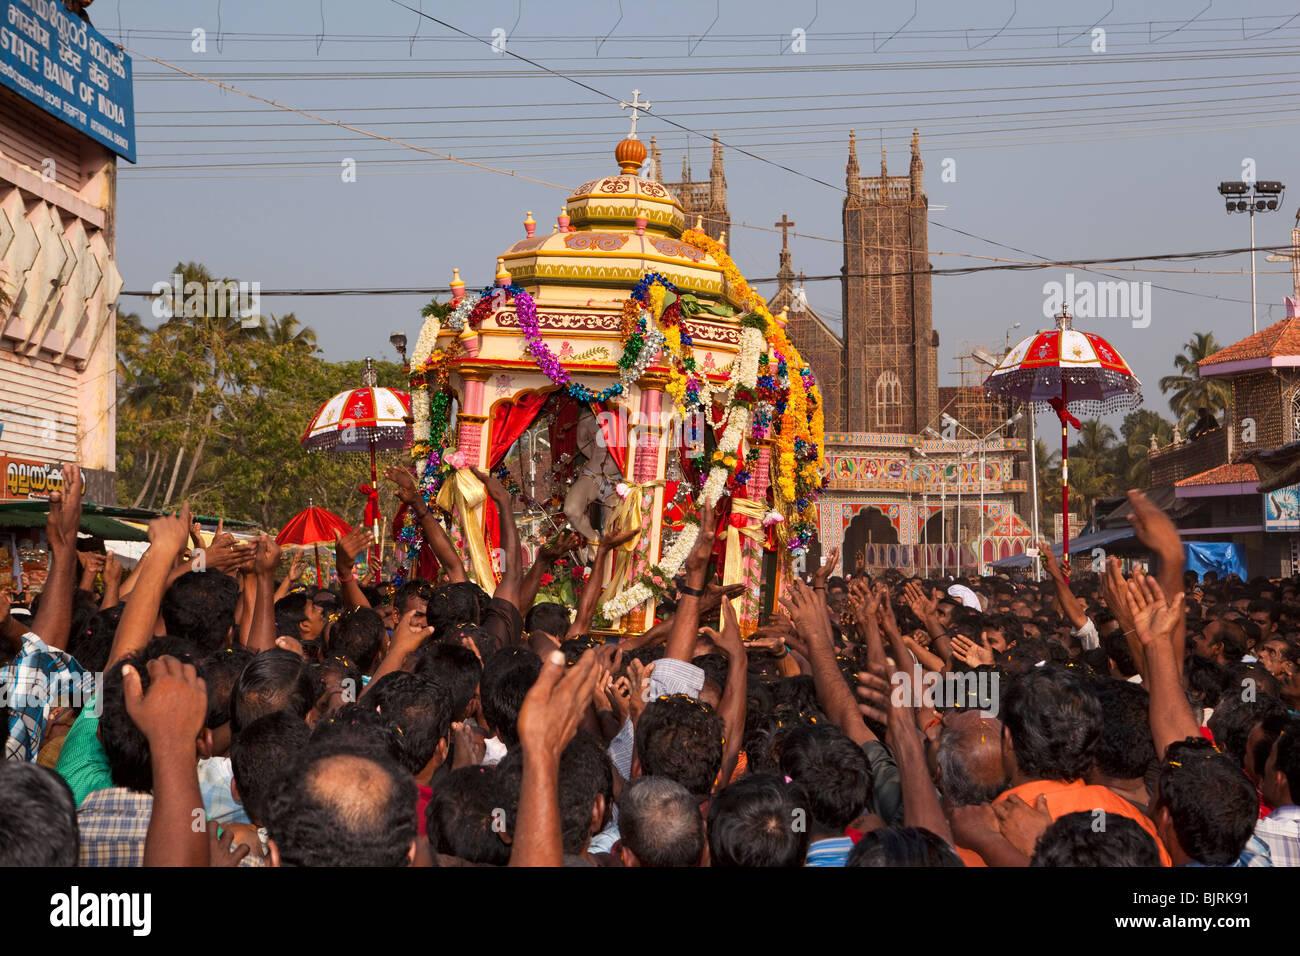 India, Kerala, Alappuzha, (Alleppey) Arthunkal, feast of St. Sebastian, pilgrims holding aloft procession icon - Stock Image